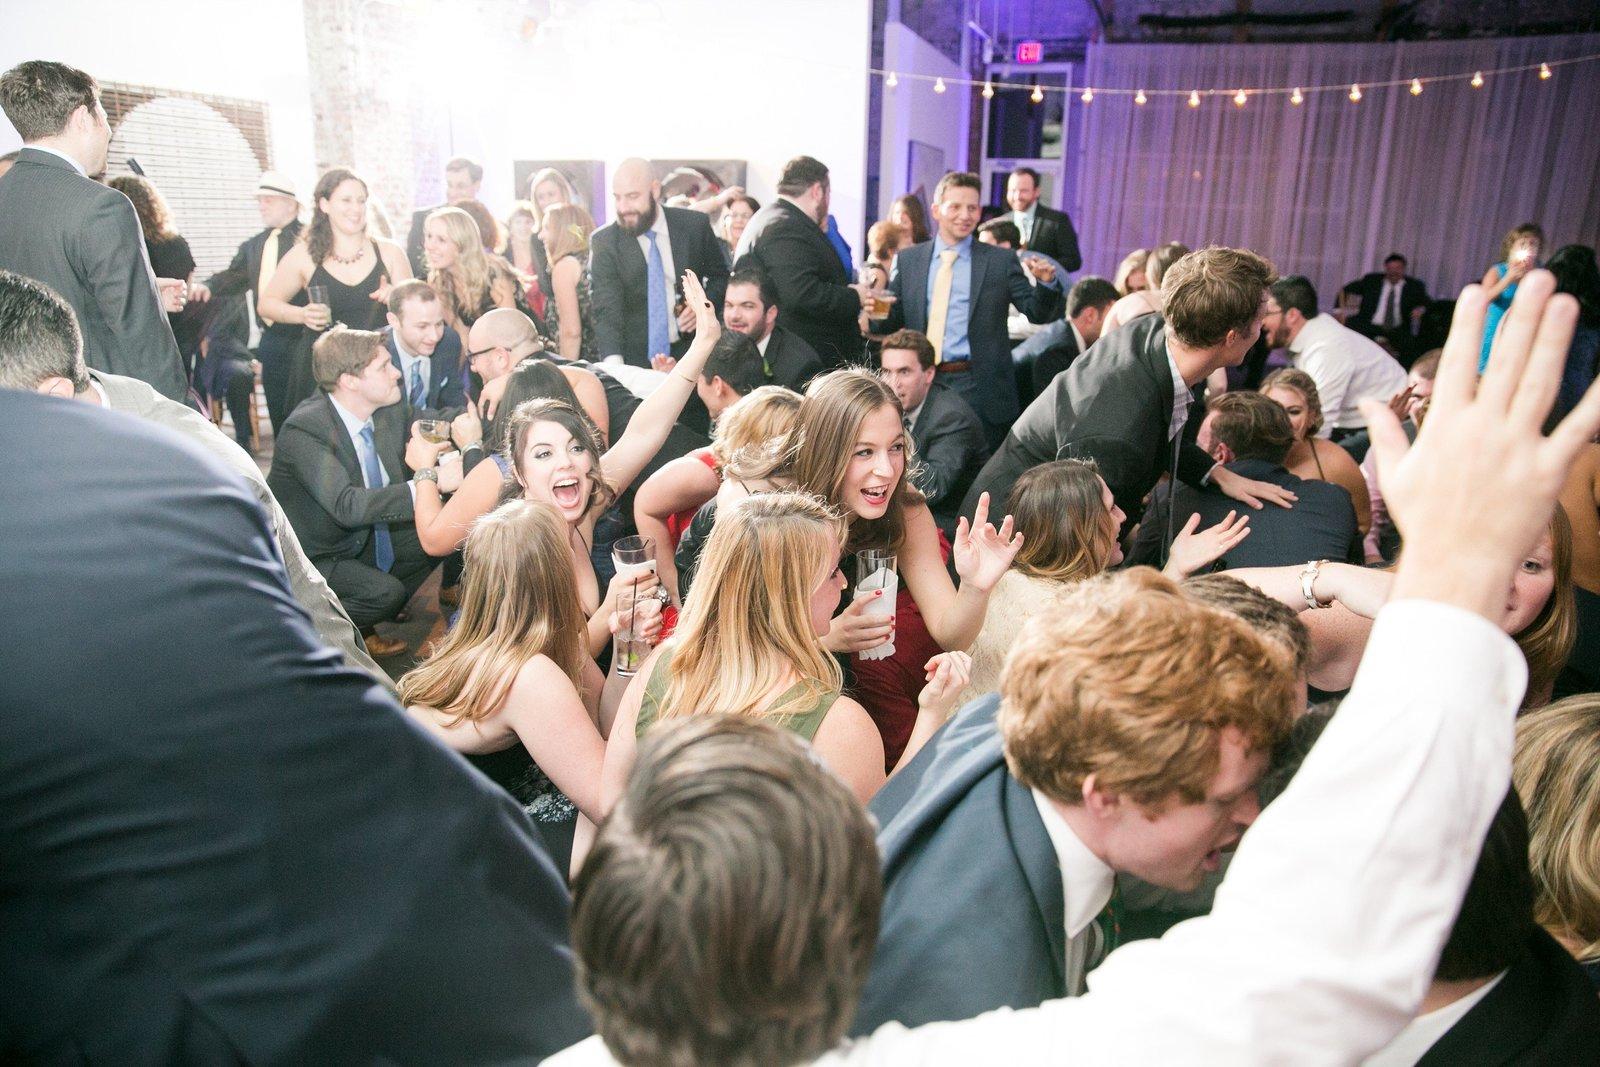 Black-tie-wedding-photos-longview-gallery-dc (231)